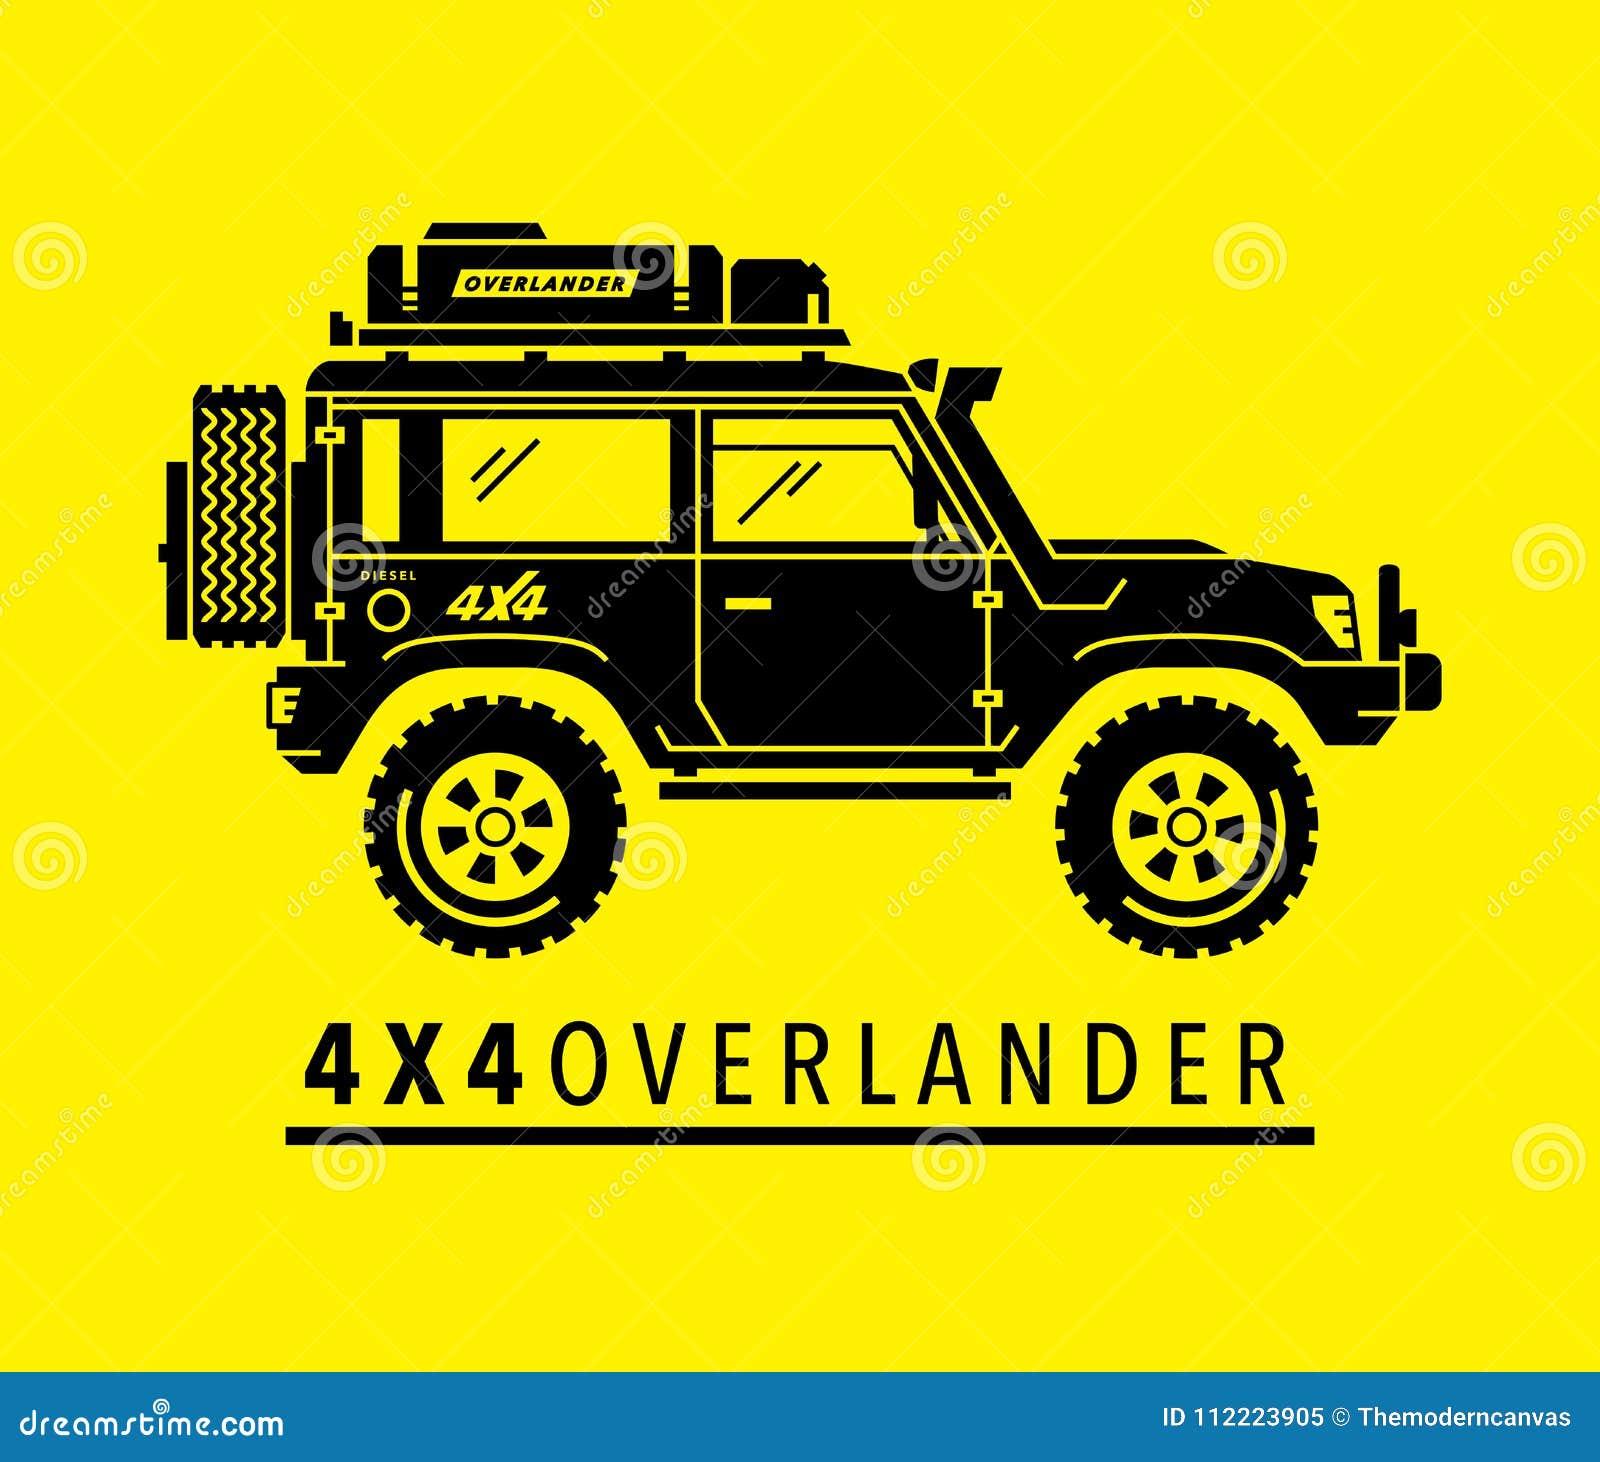 Overland Off Road 4x4 All Terrain 4wd Suv Safari Vehicle Stock Vector Illustration Of Black Motor 112223905